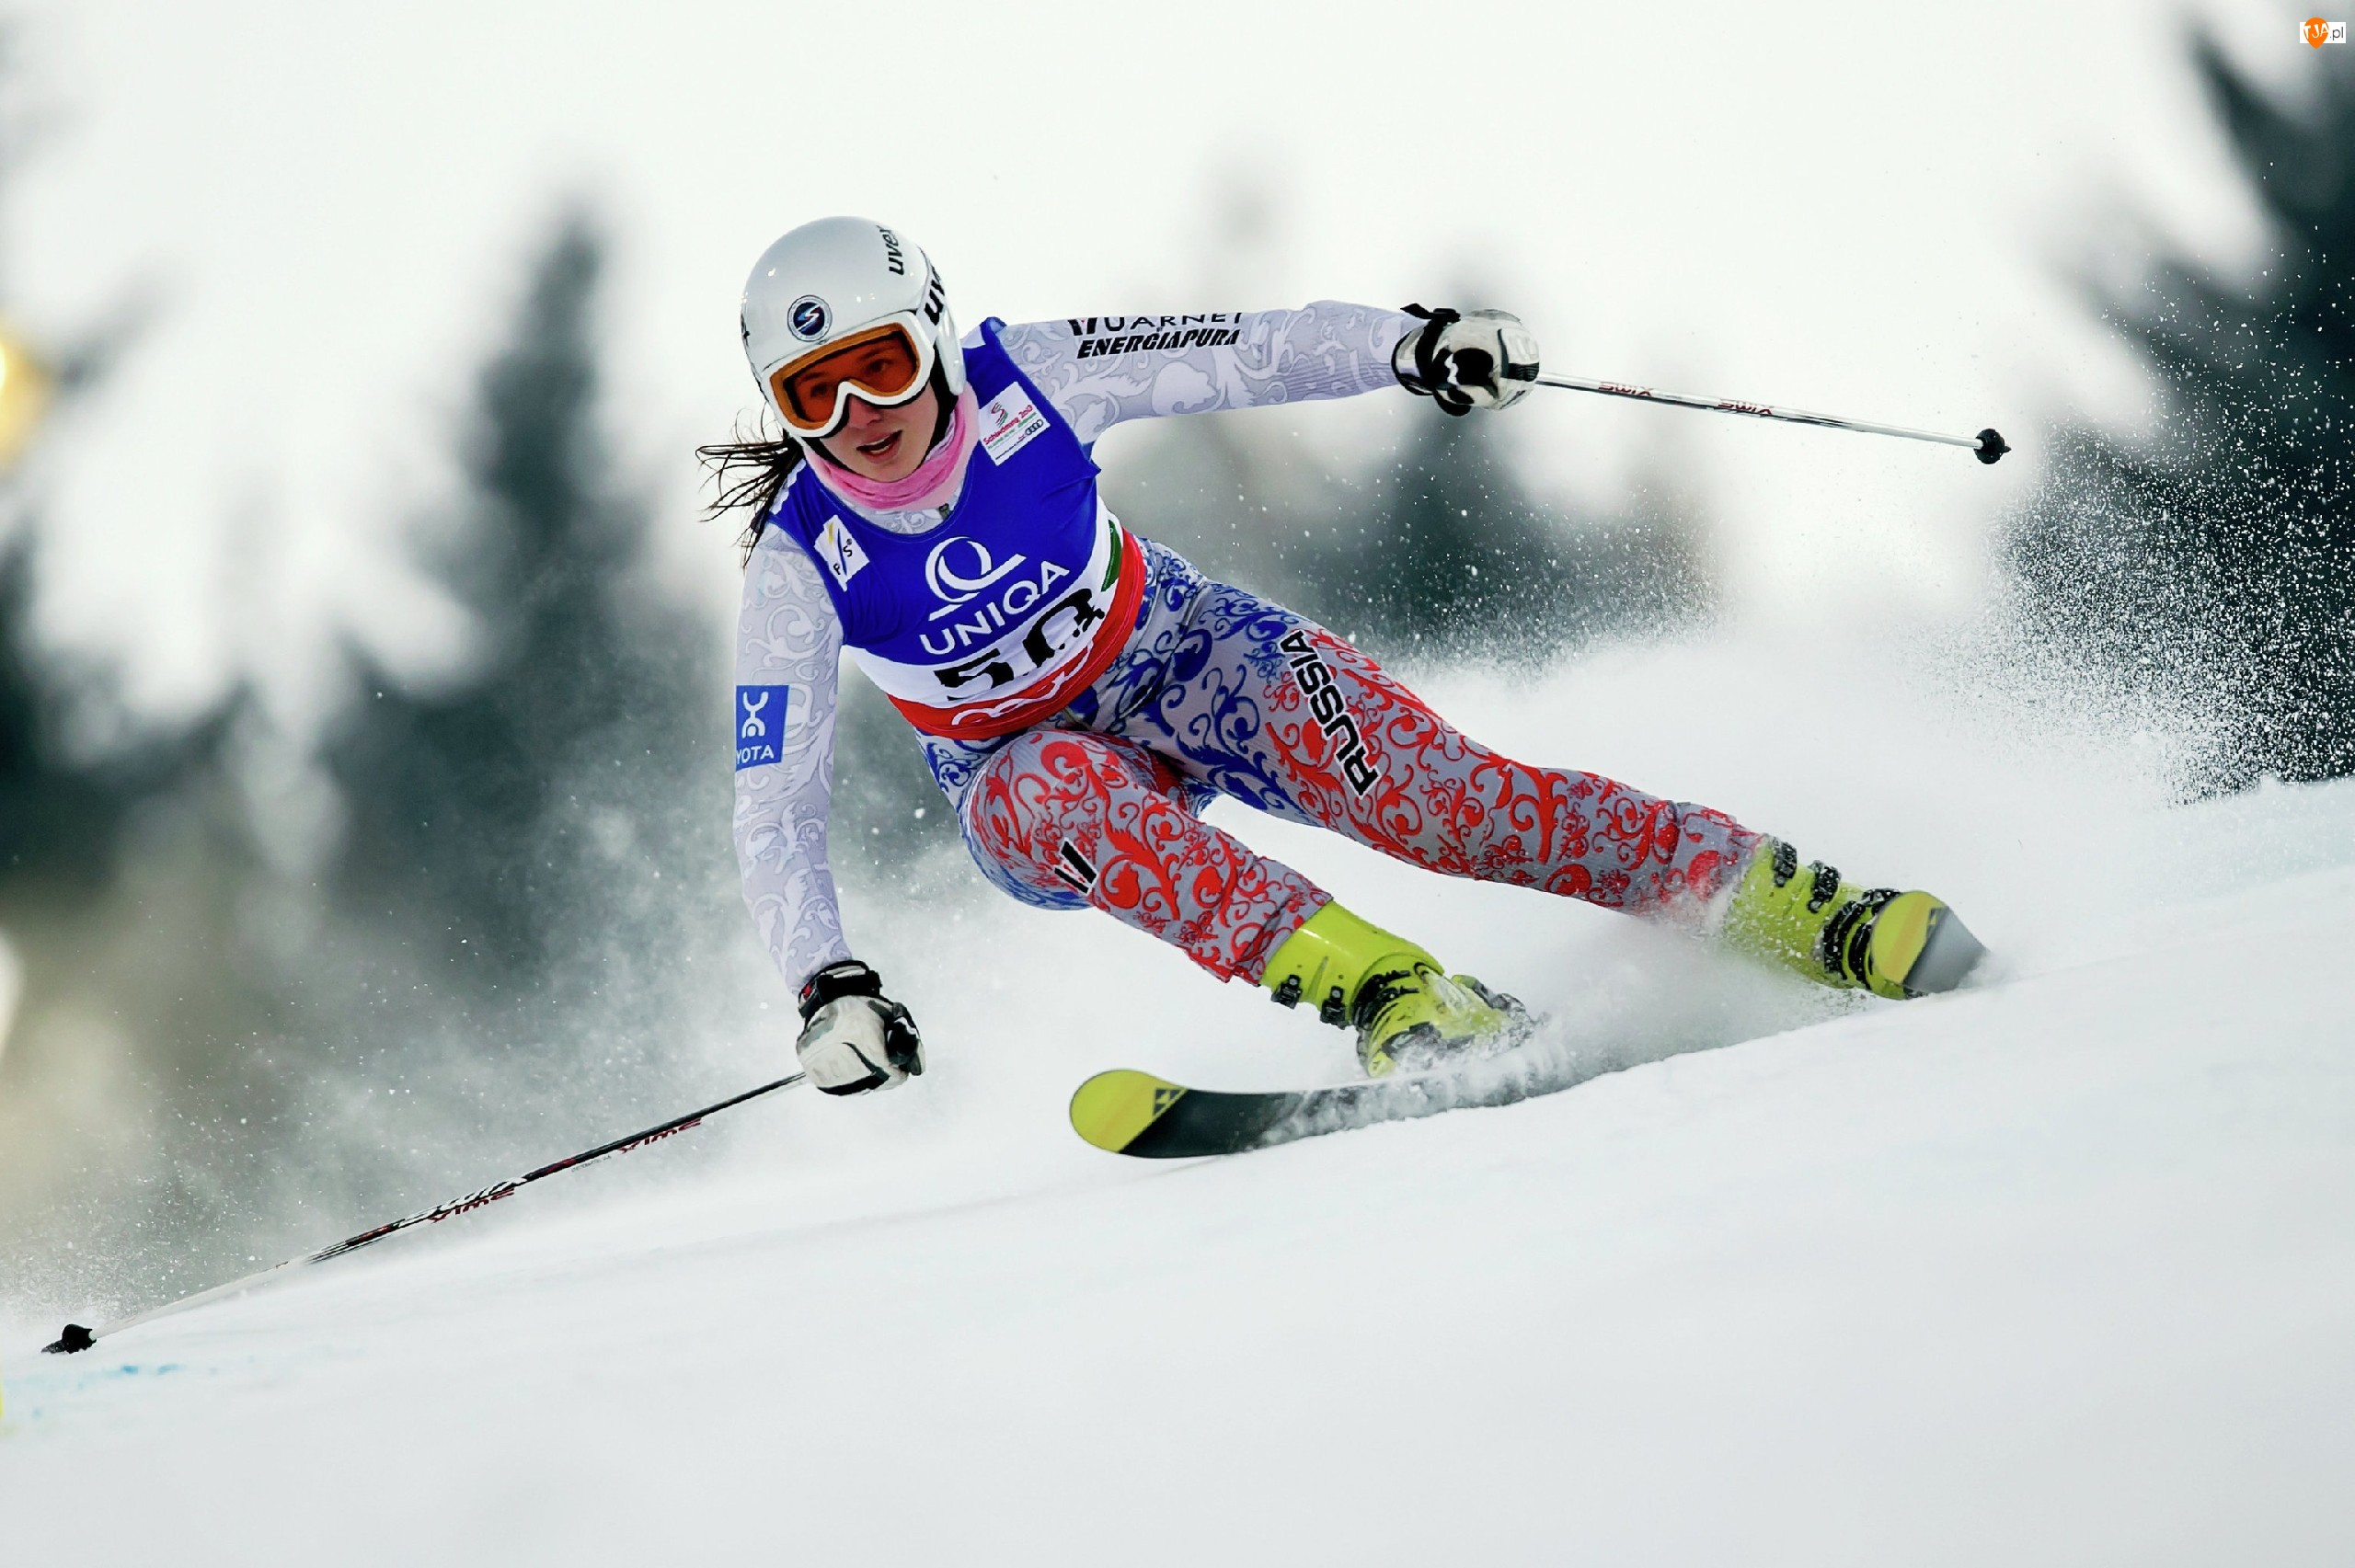 Kobieta, Olimpiada, Narciarka, Sochi 22014